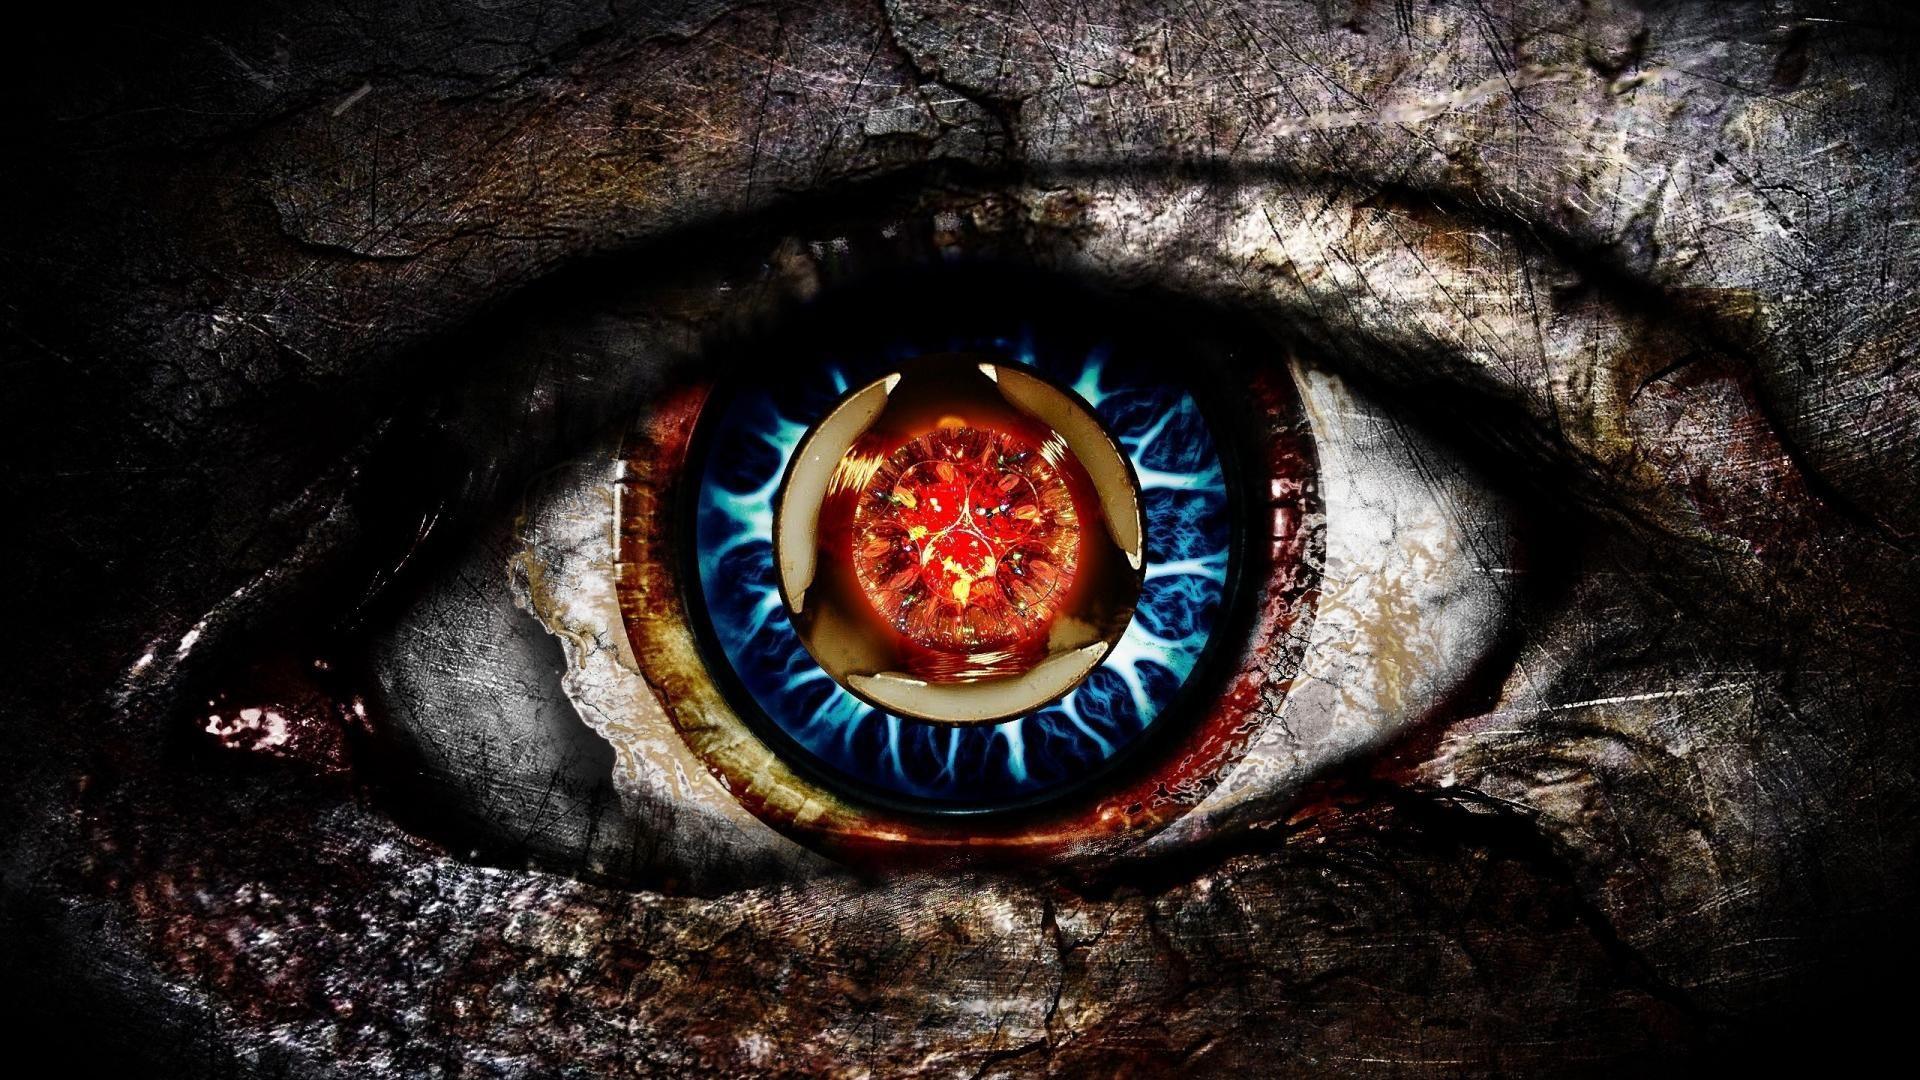 Hd wallpaper eyes - Drakensang The Dark Eye My Hd Wallpaper